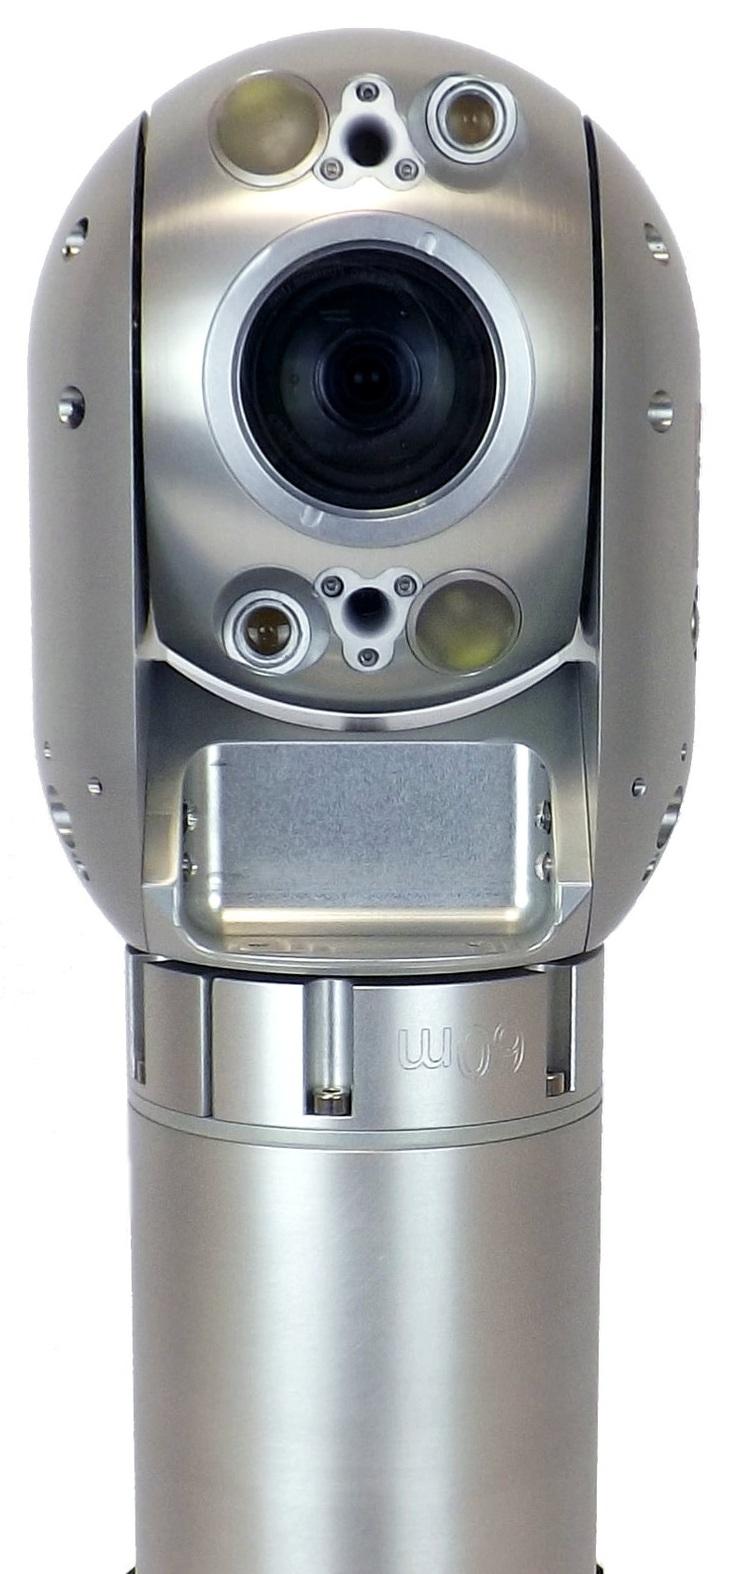 Inuktun Spectrum 120HD™ inspection camera